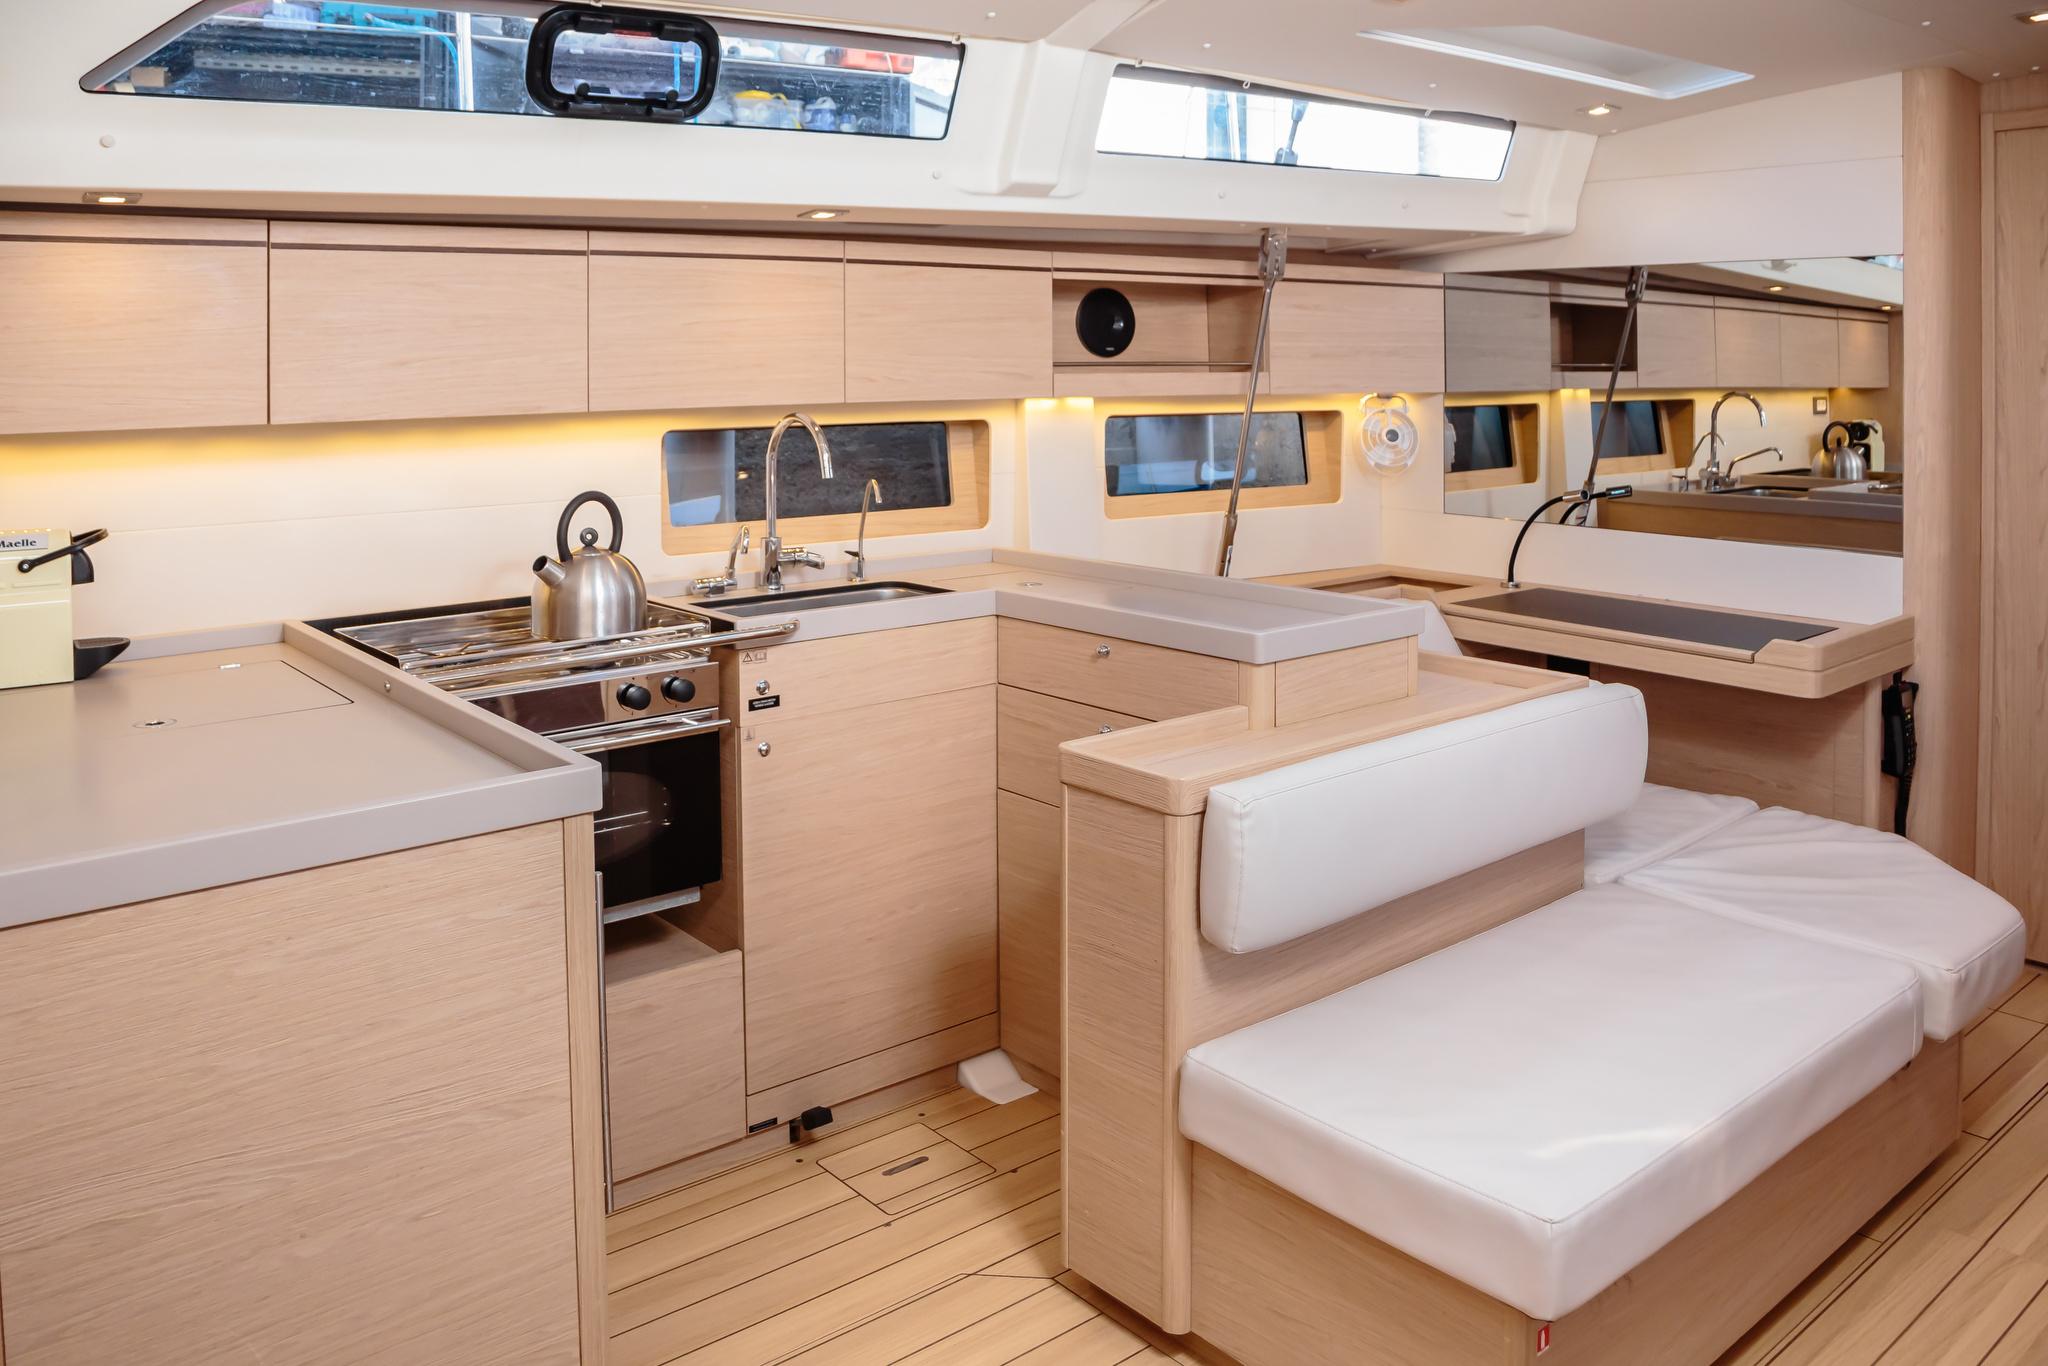 Oceanis 51.1 (Maelle) cucina e piano carteggio - 4